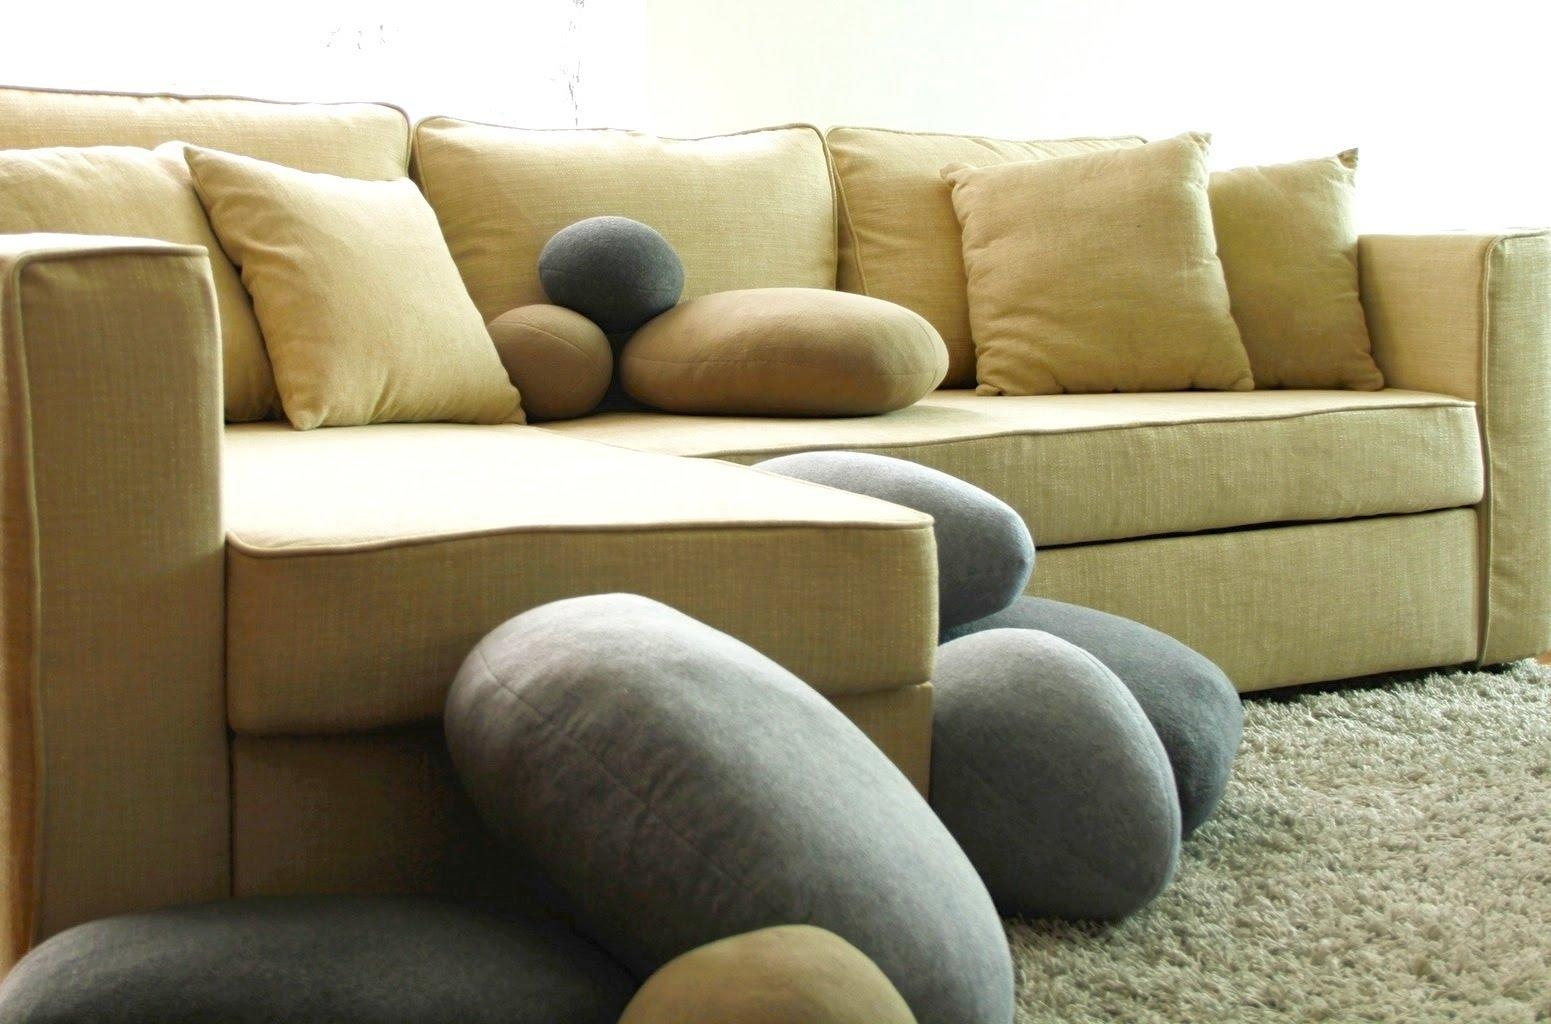 Slipcover For Ikea Manstad Sofa Bed – Snug Fit Version – Youtube Regarding Manstad Sofa Bed (View 12 of 20)